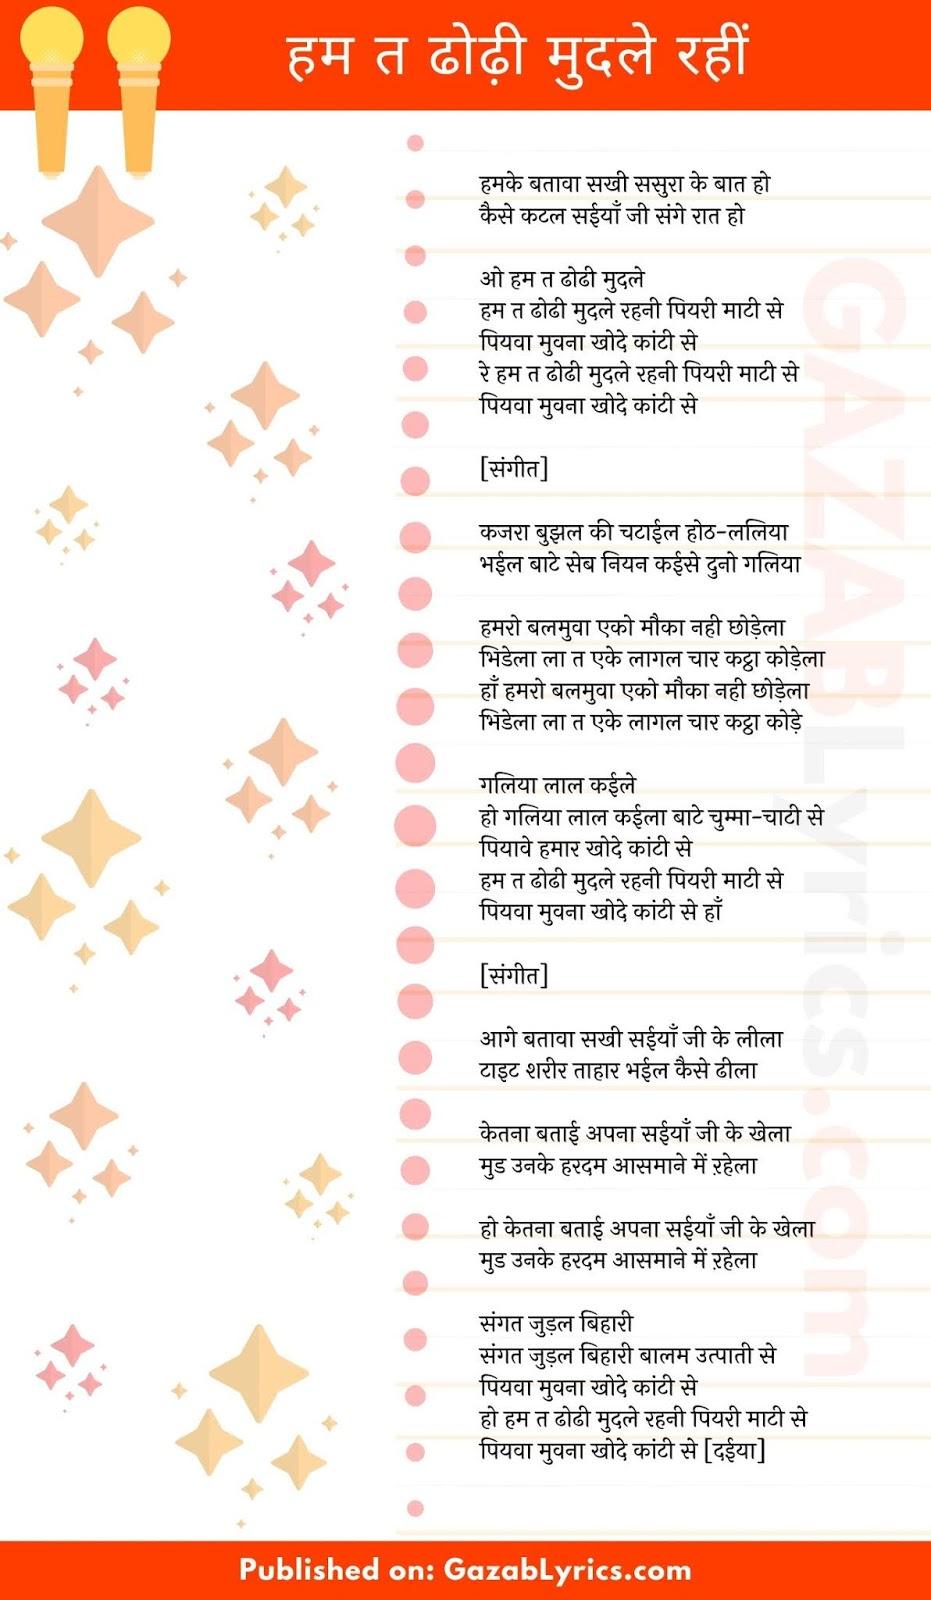 Hum Ta Dhodhi Mudale Rahni song lyrics image